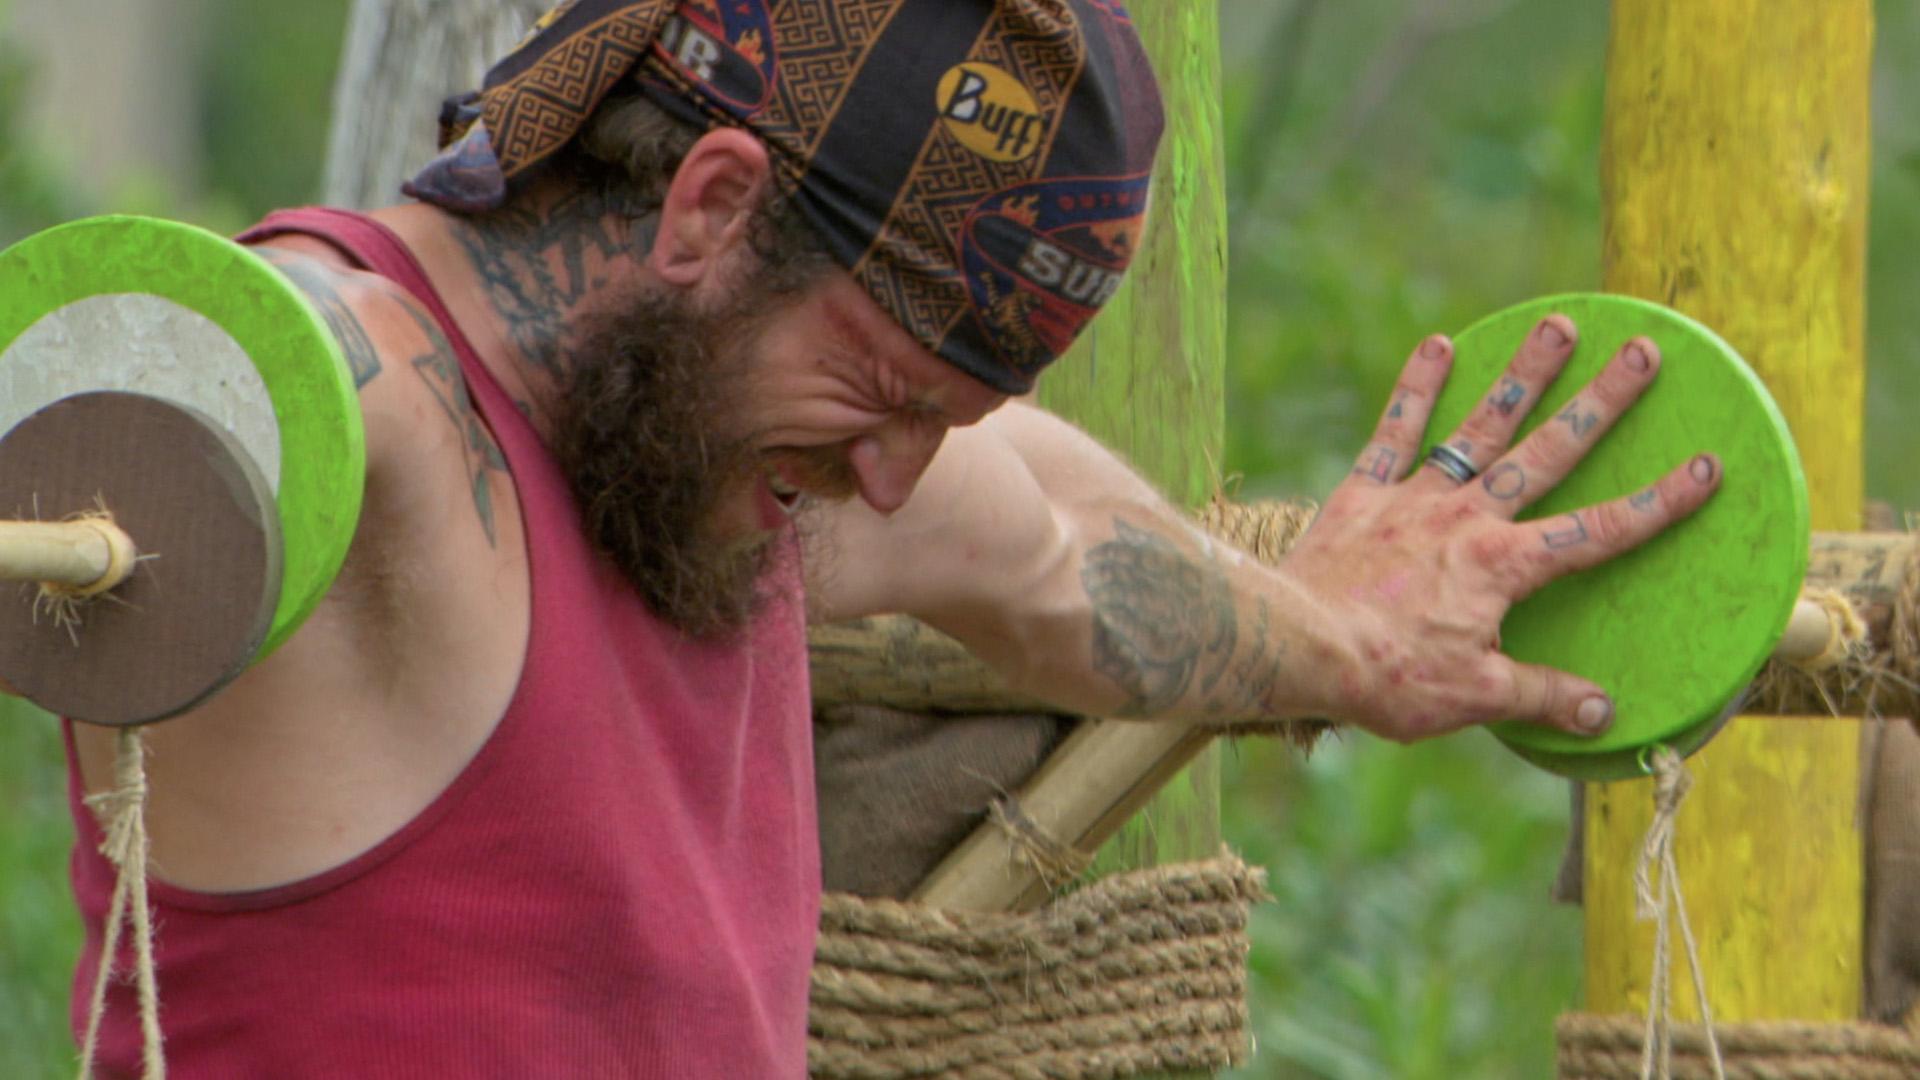 Episode 10: Jason experiences agonizing pain during a brutal Immunity Challenge.